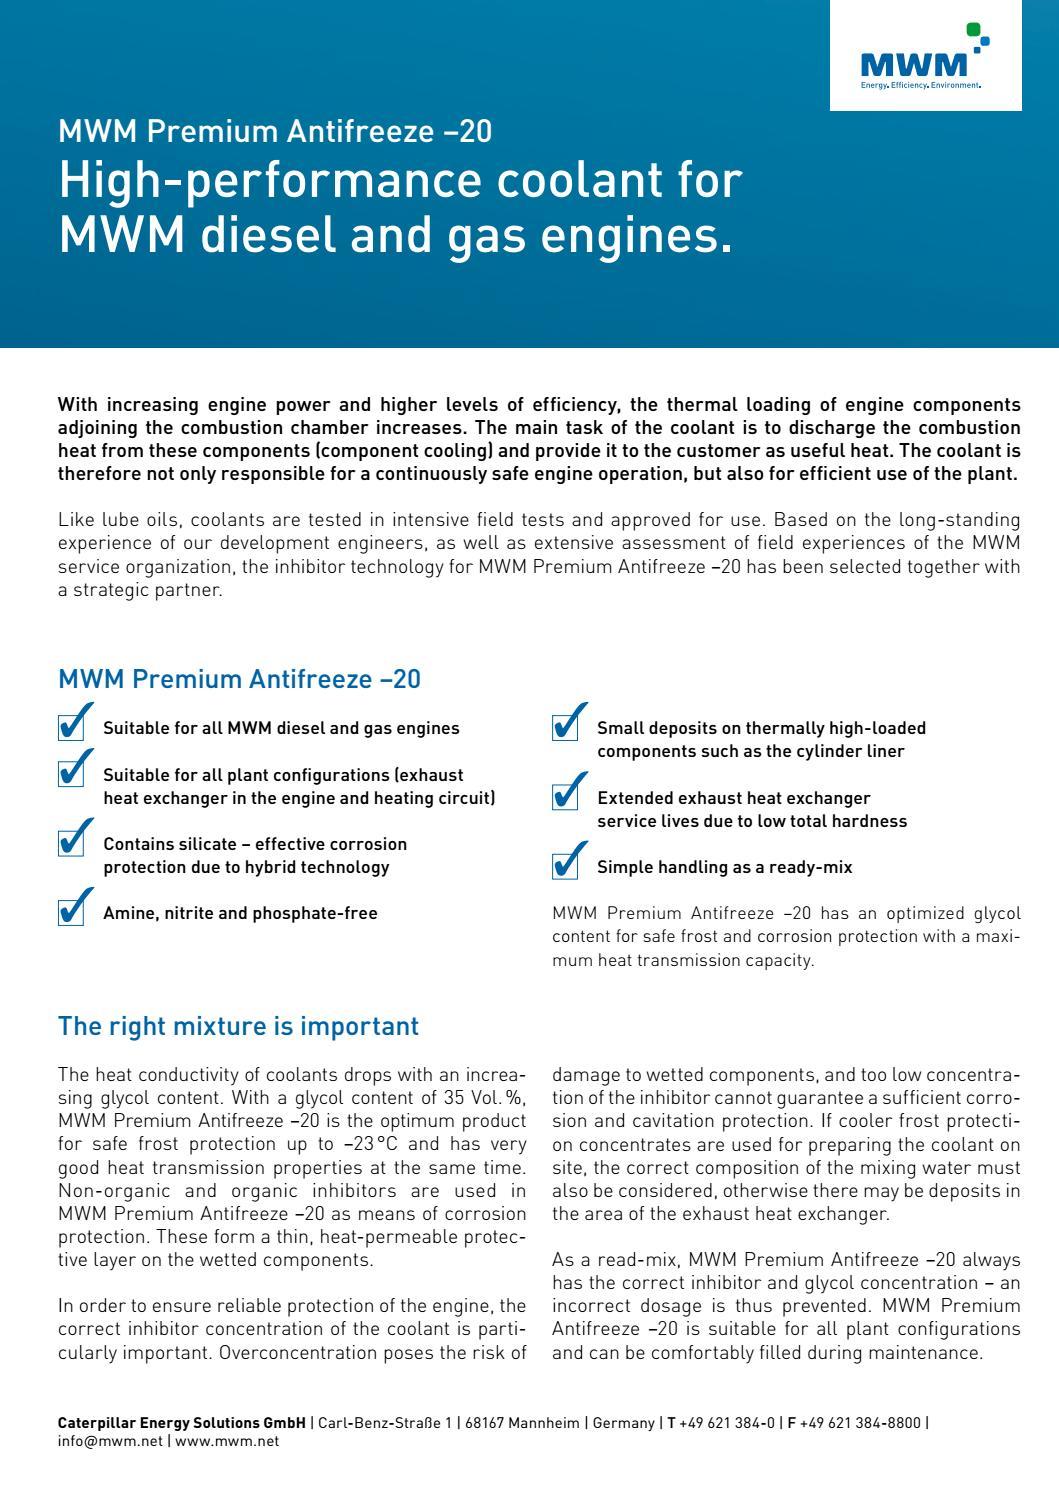 MWM Premium Antifreeze -20 en by MWM Gas Engines